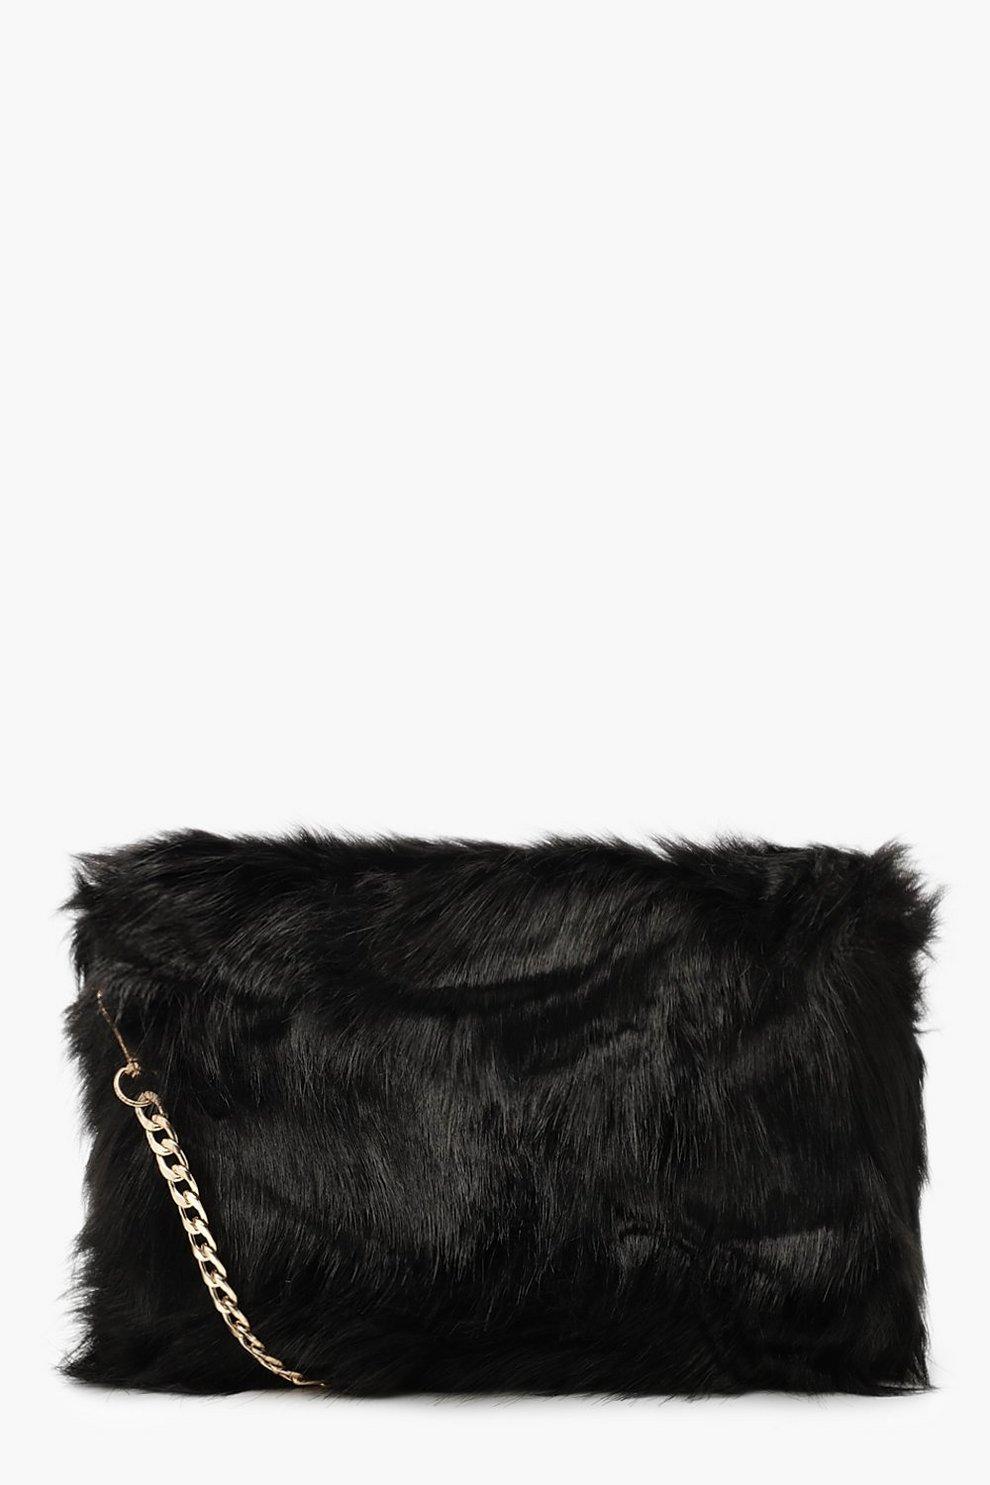 8a18774e60 Foldover Faux Fur Cross Body Bag